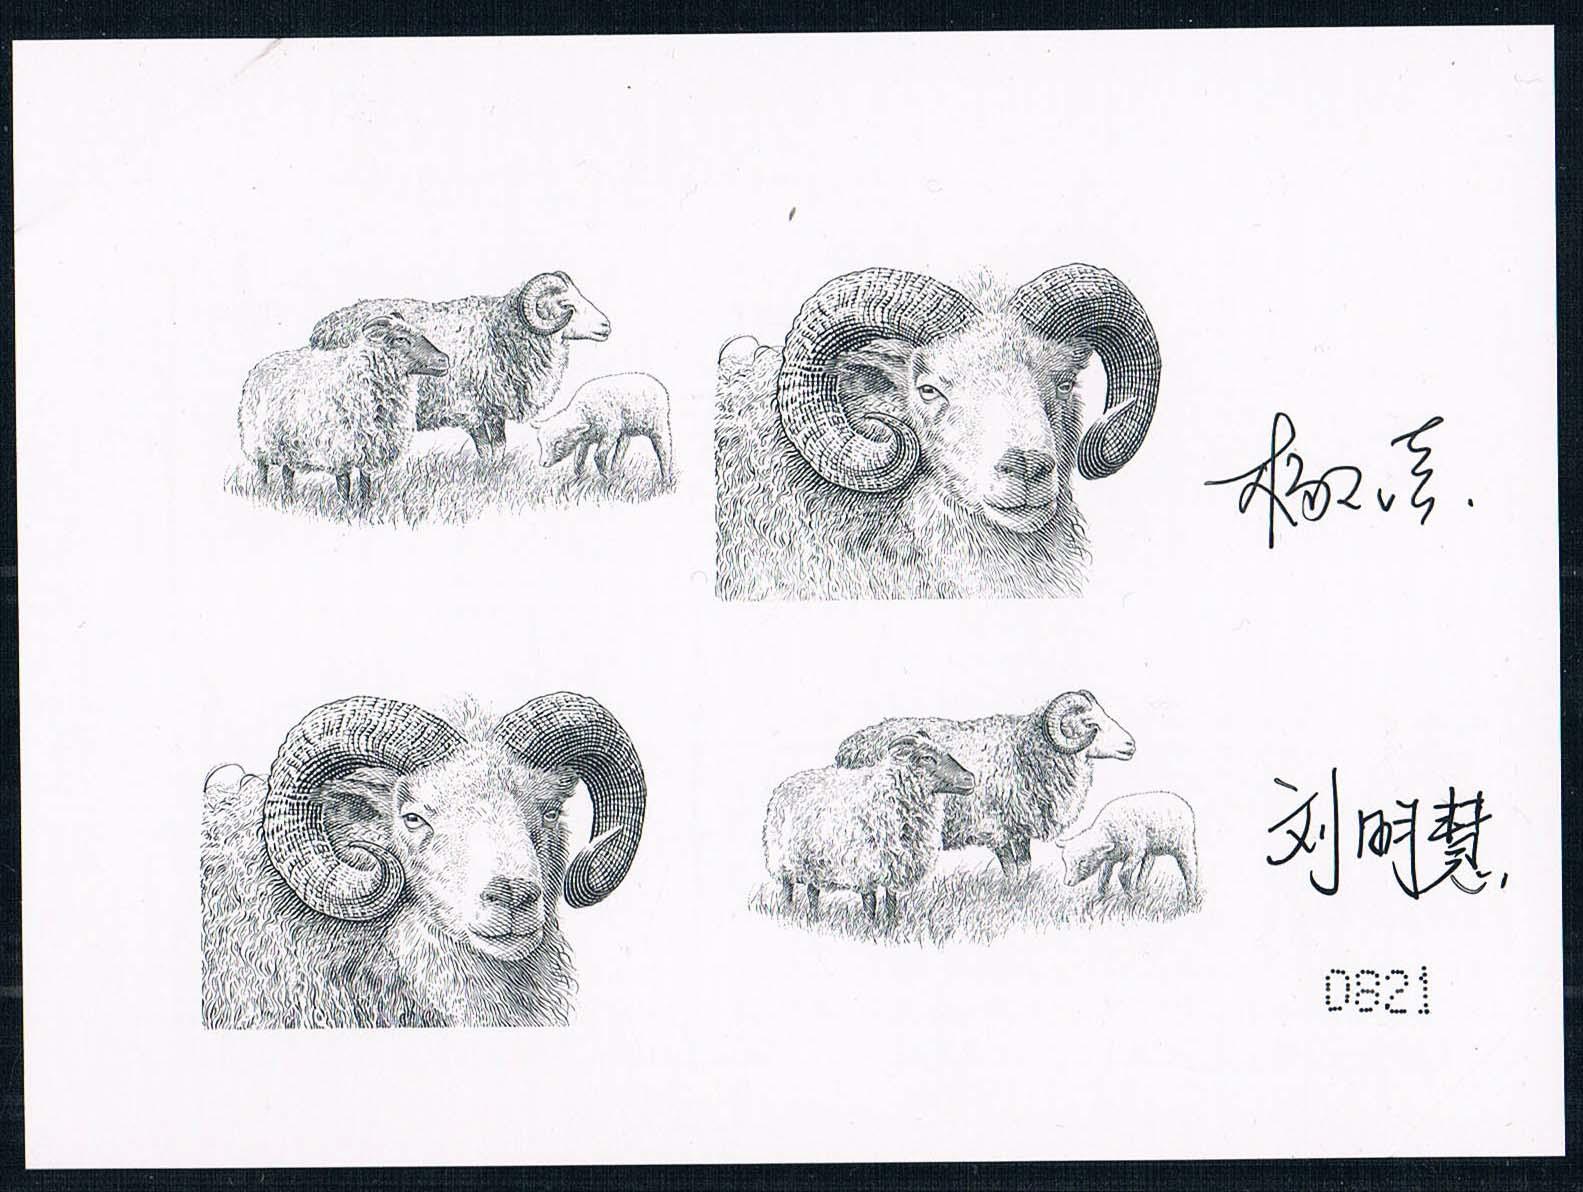 CX0429 islands 2014 years Yiwei Zodiac sheep engraver signature print 1 new explanation 1201 робот zodiac ov3400